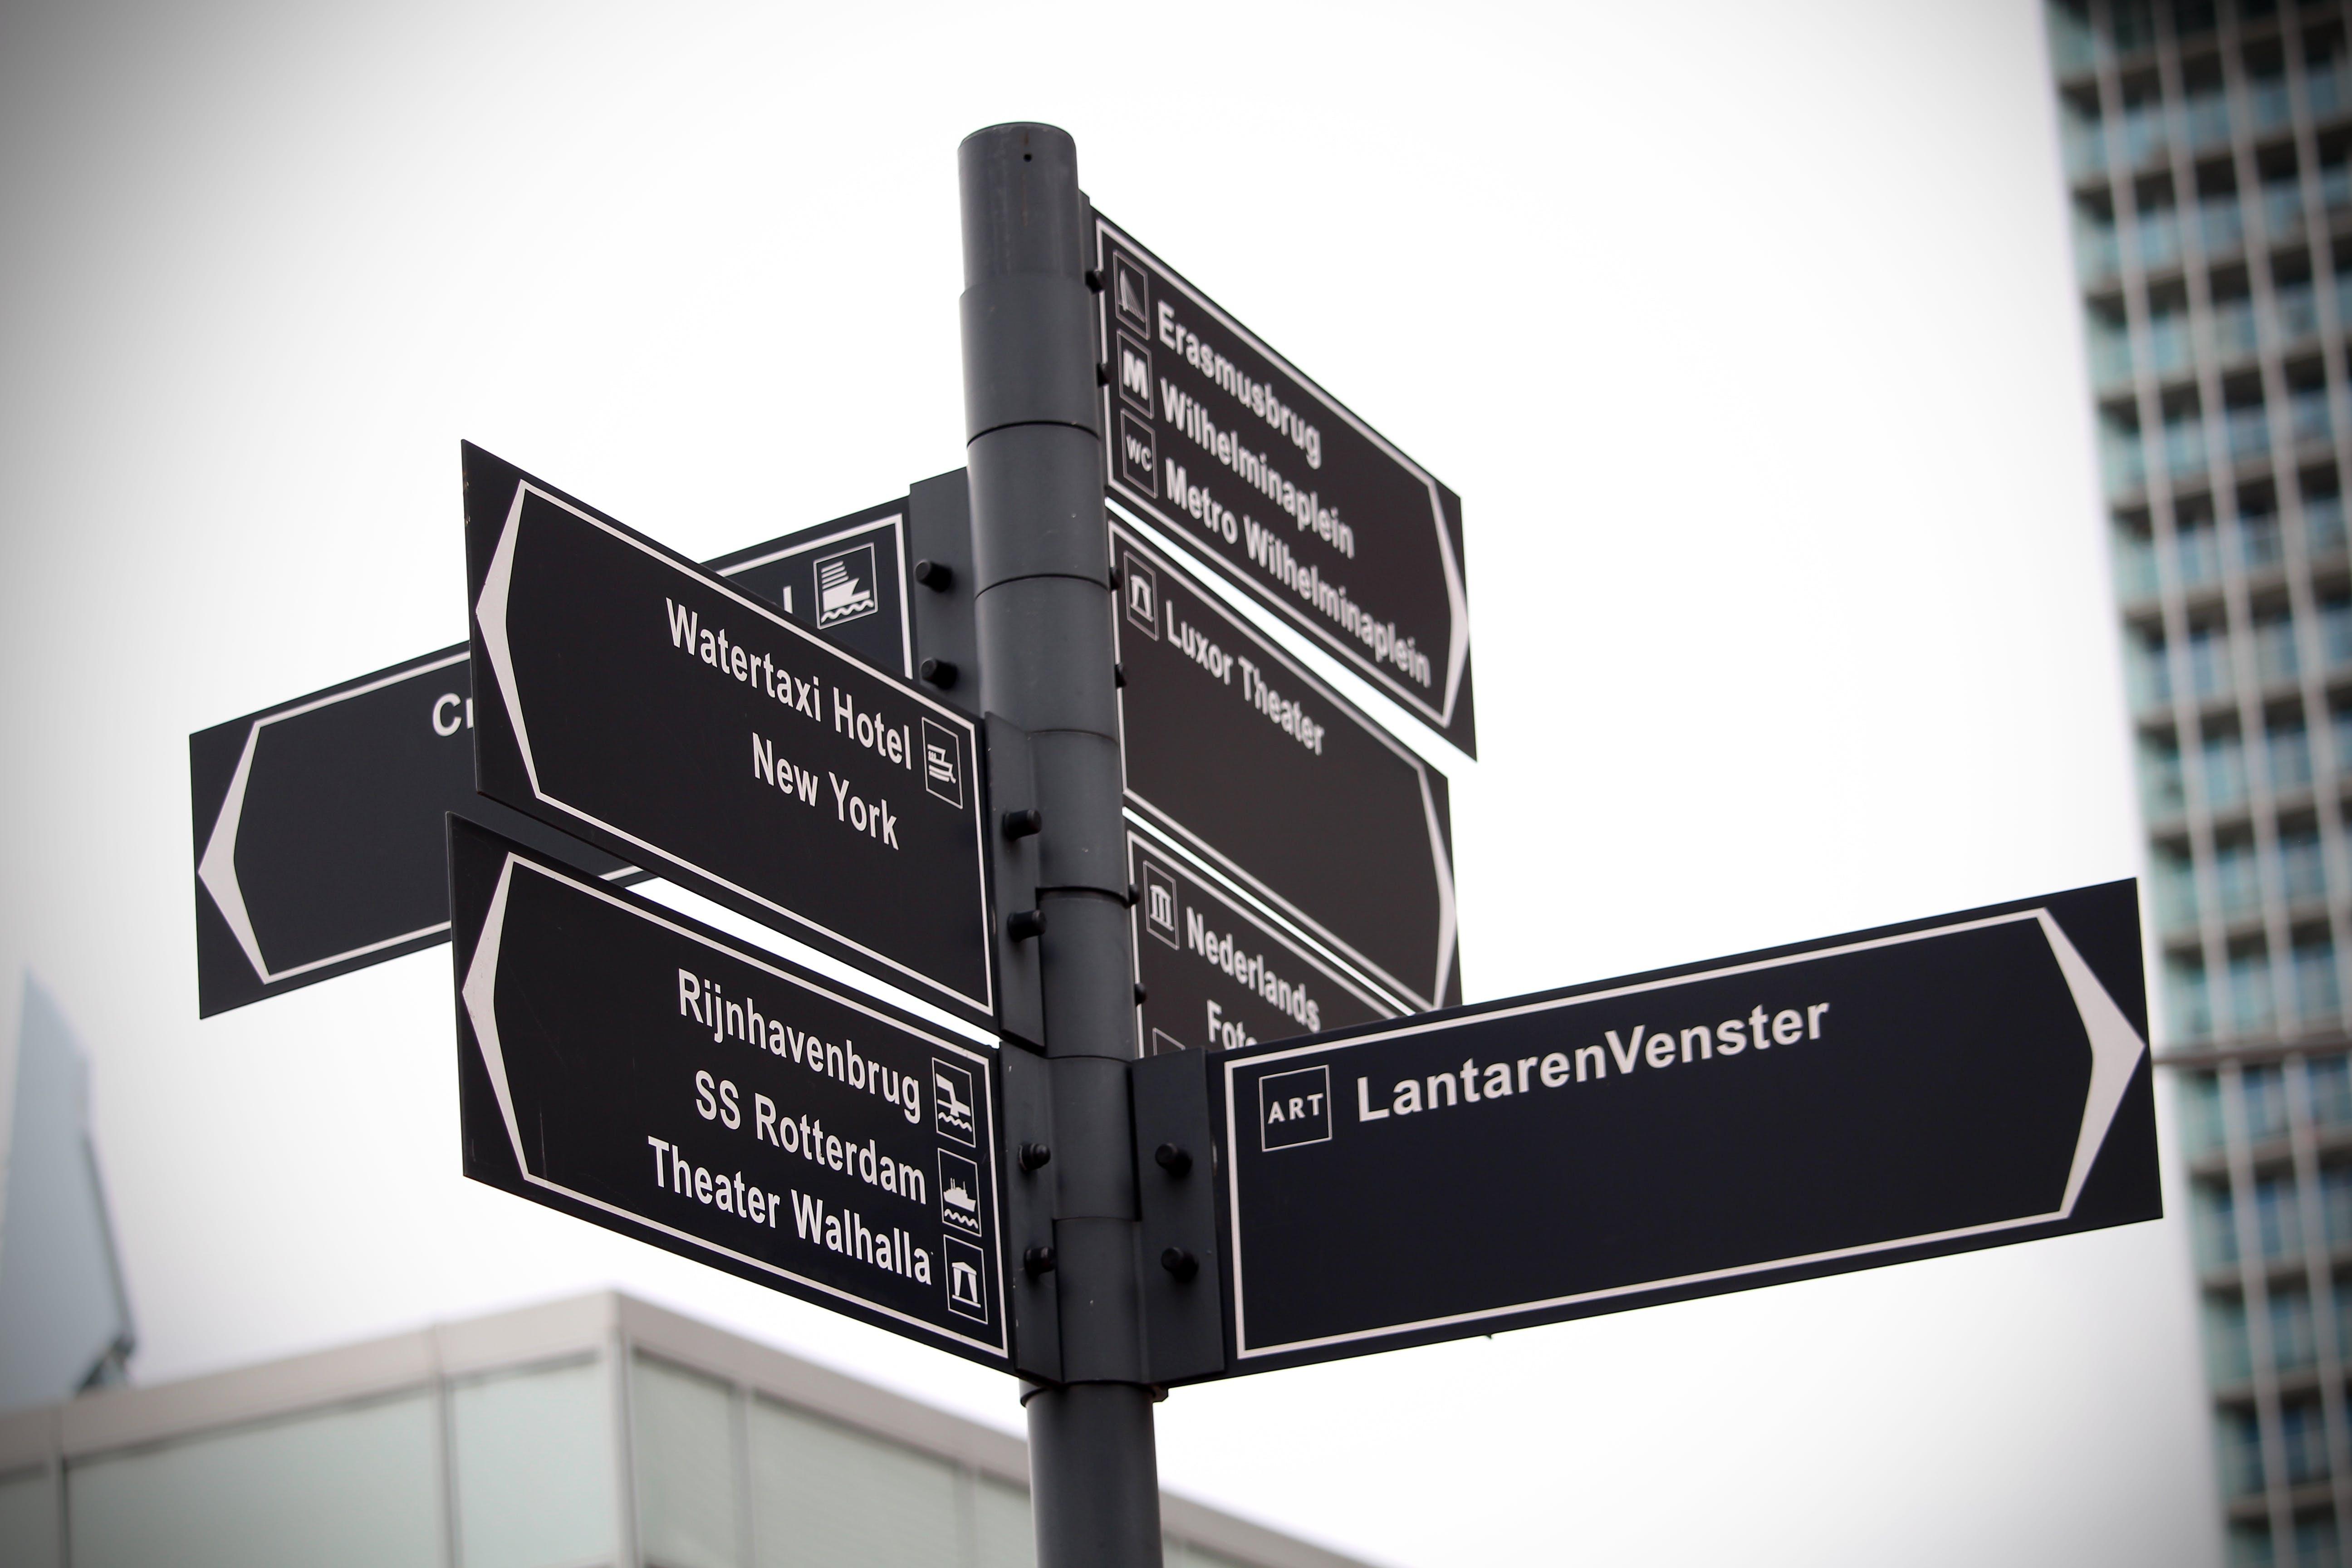 Assorted Road Signage